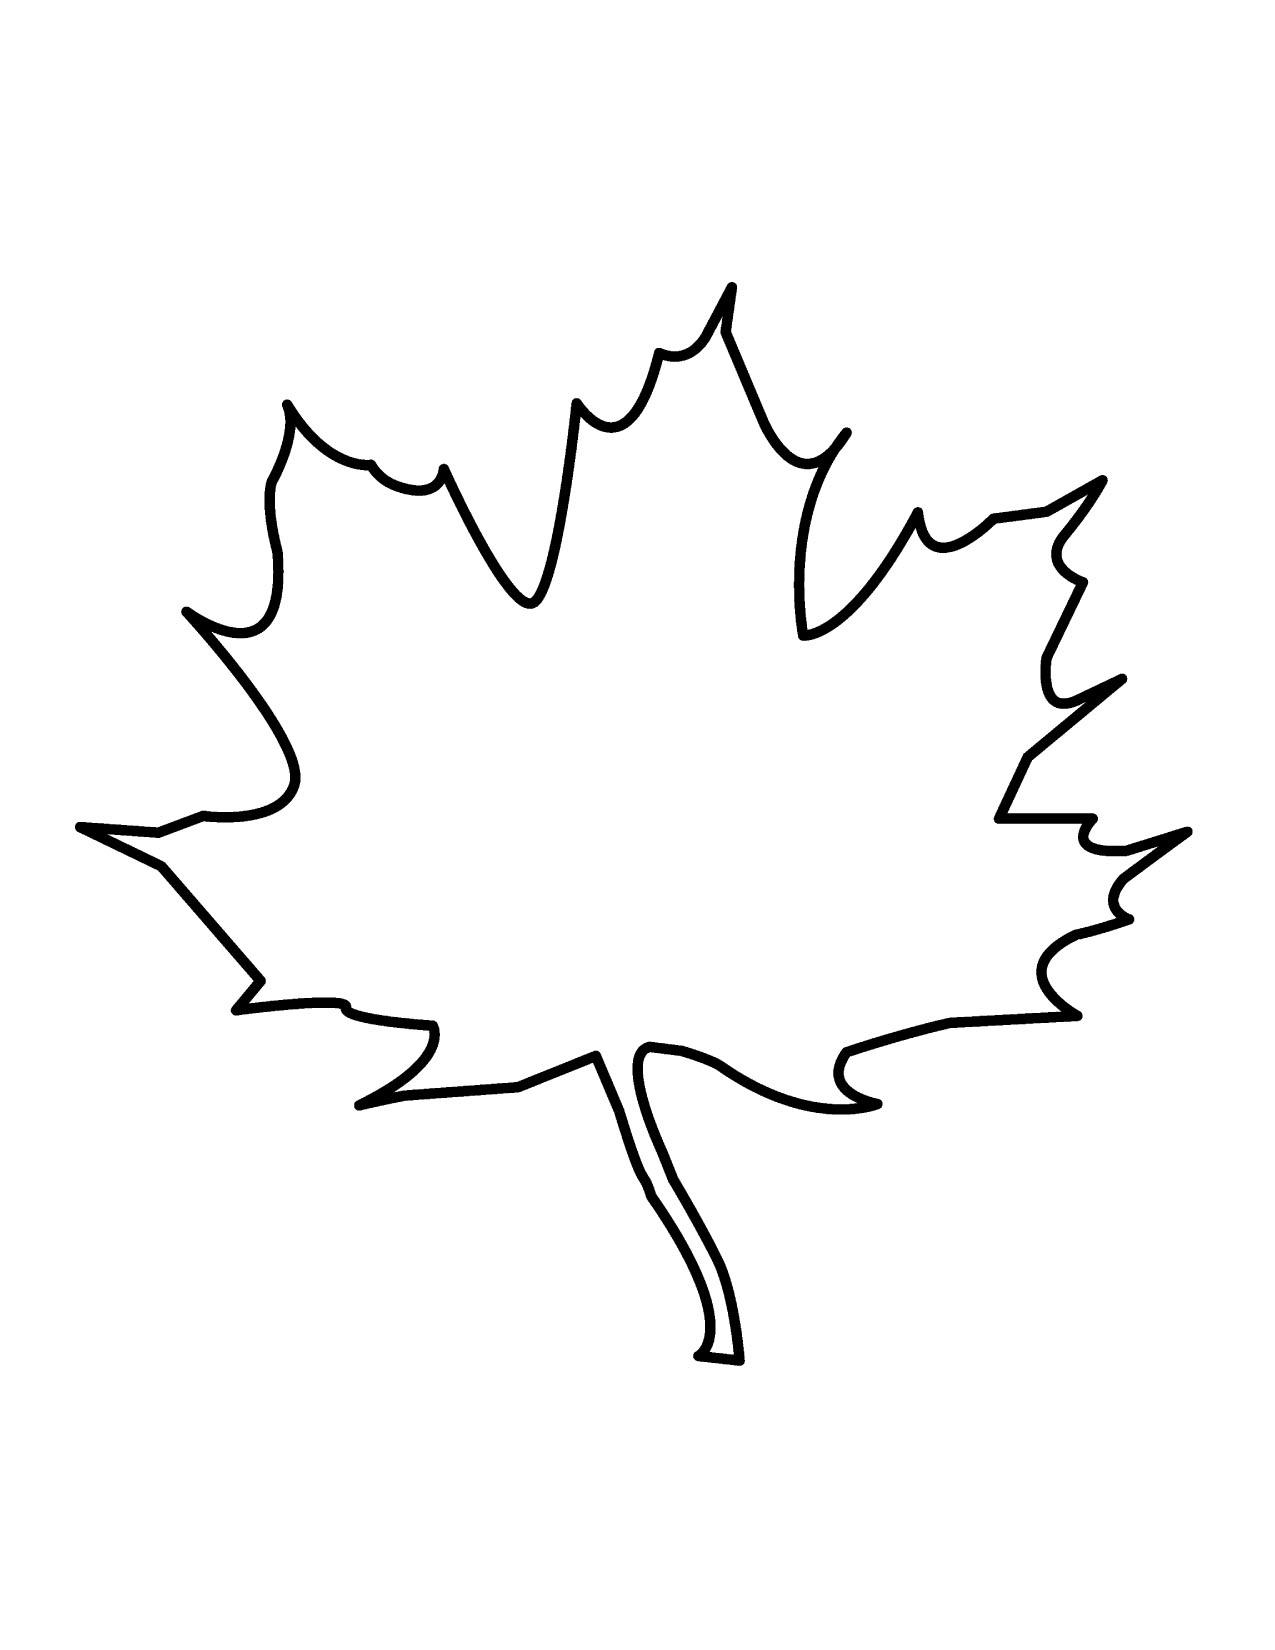 1275x1650 Leaf Clip Art Black And White